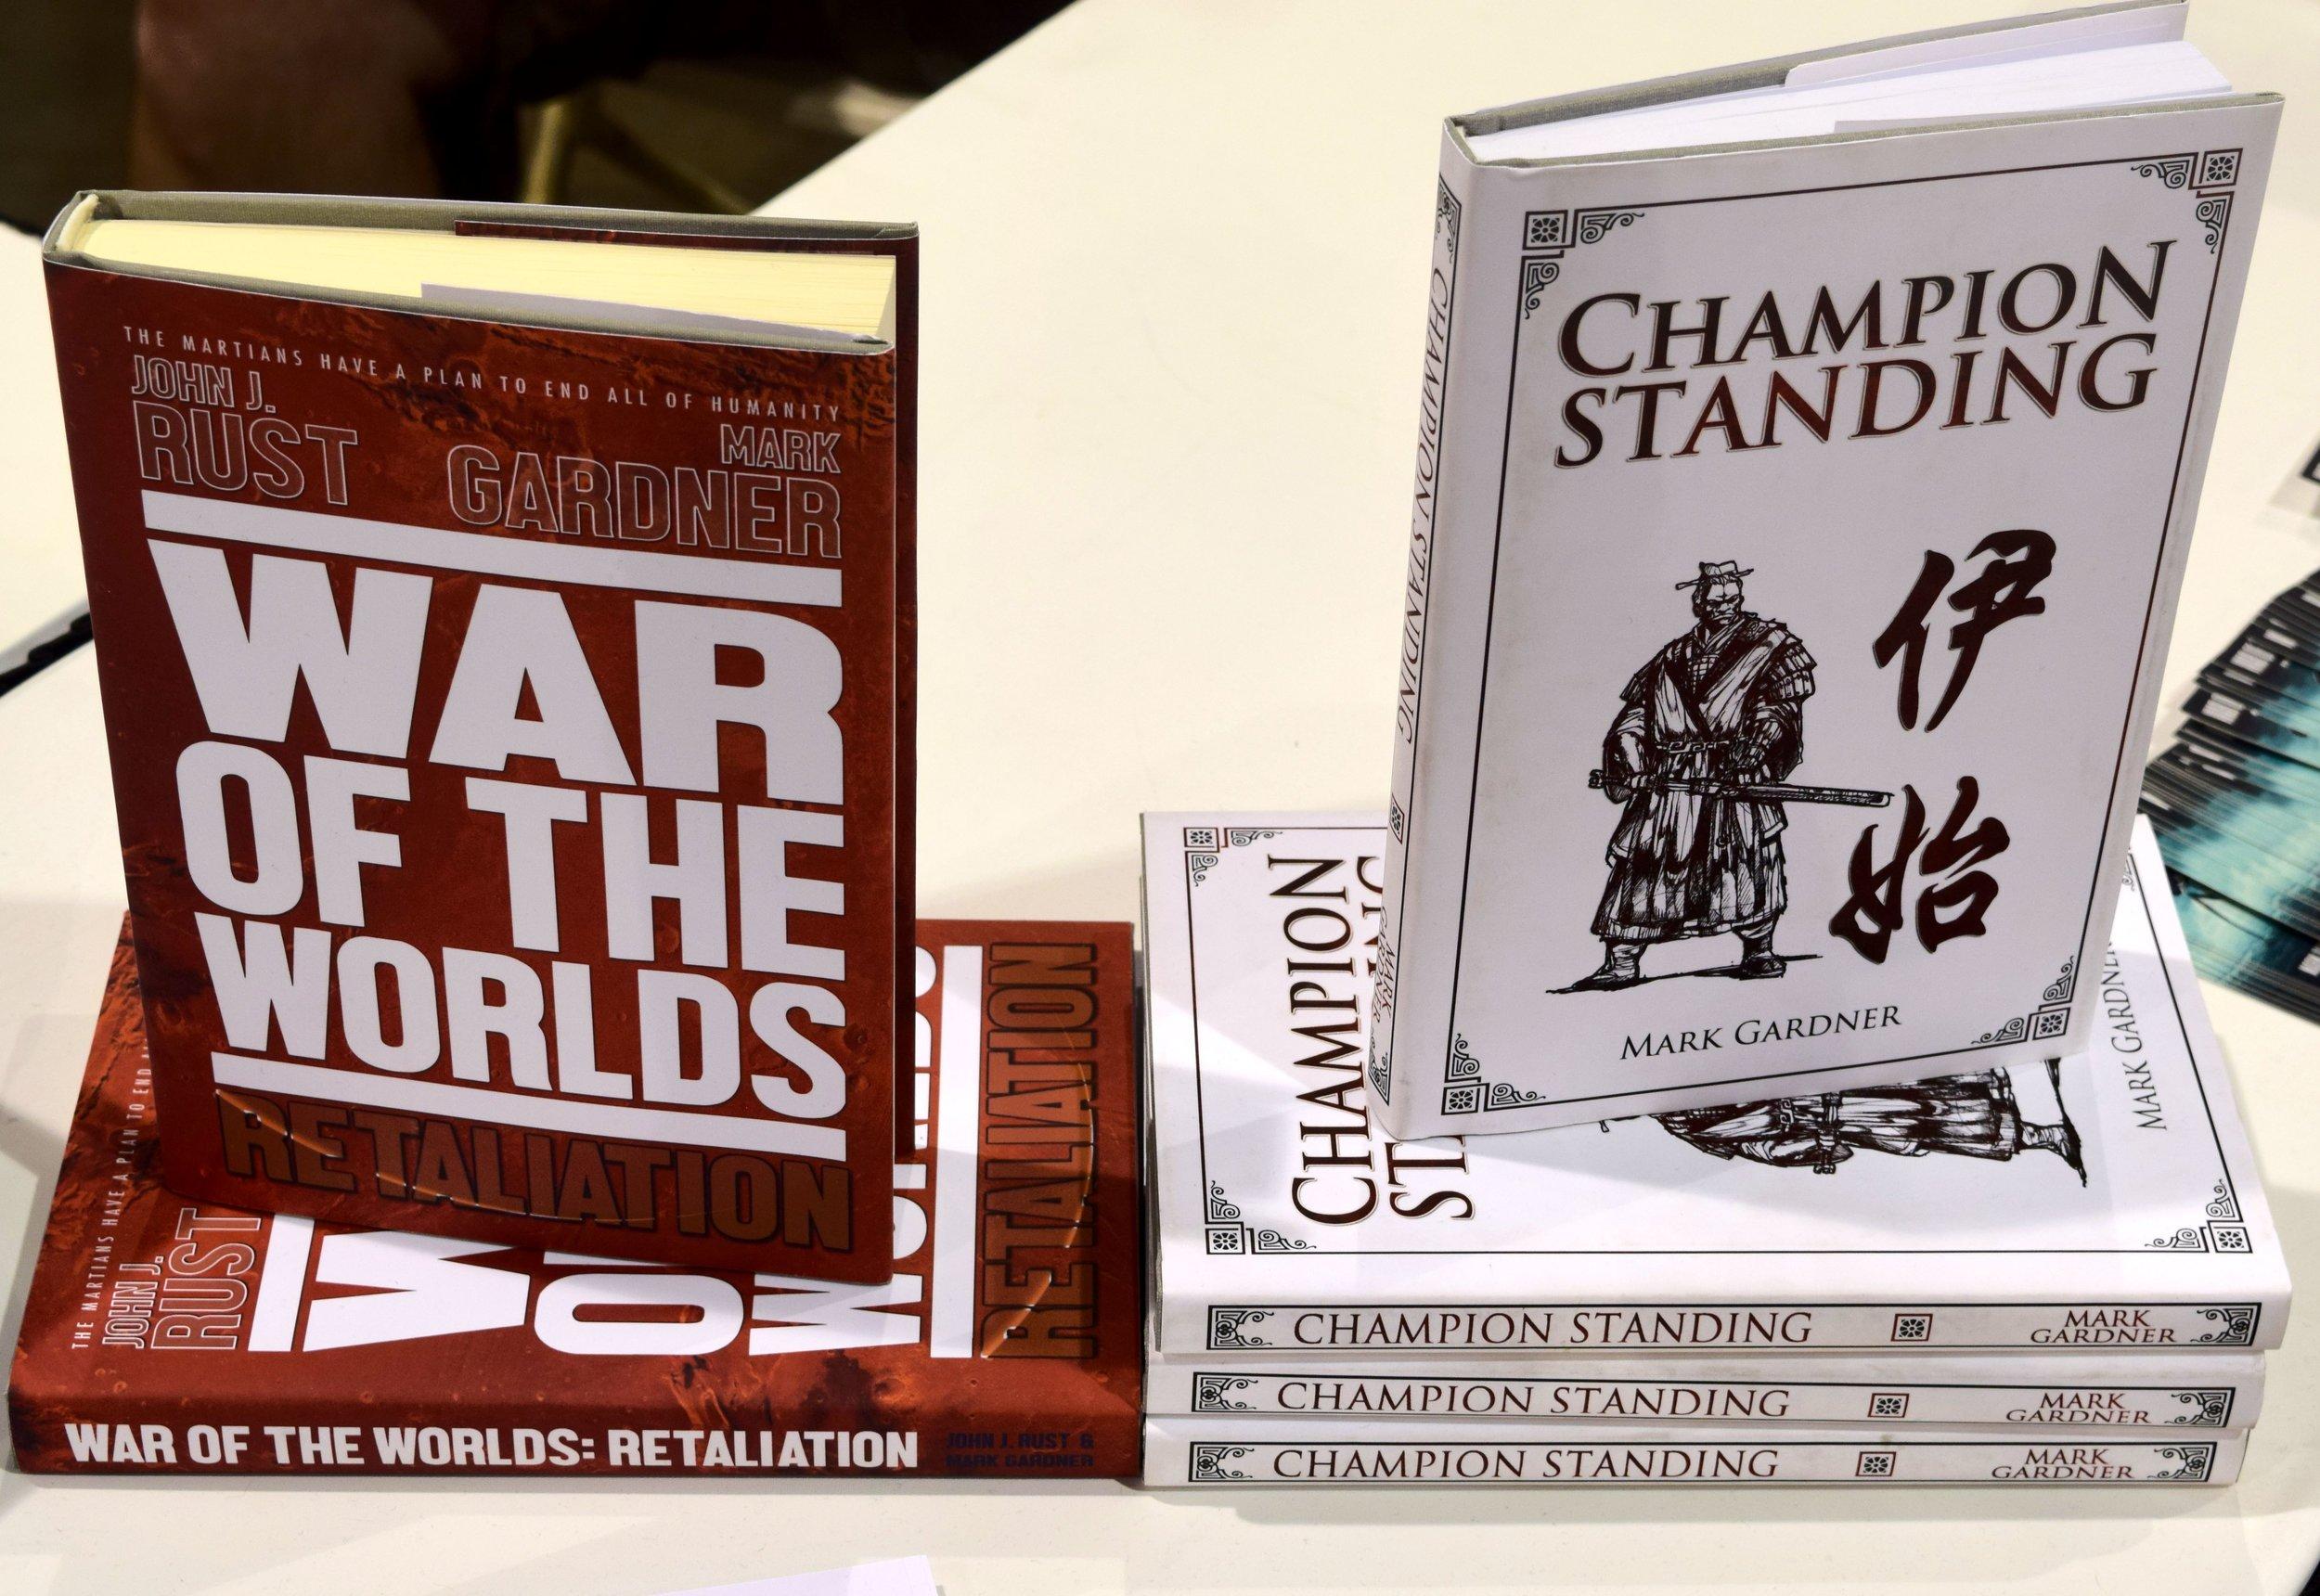 Hardcovers from Mark Gardner & John J. Rust at Phoenix Comic Con 2017.